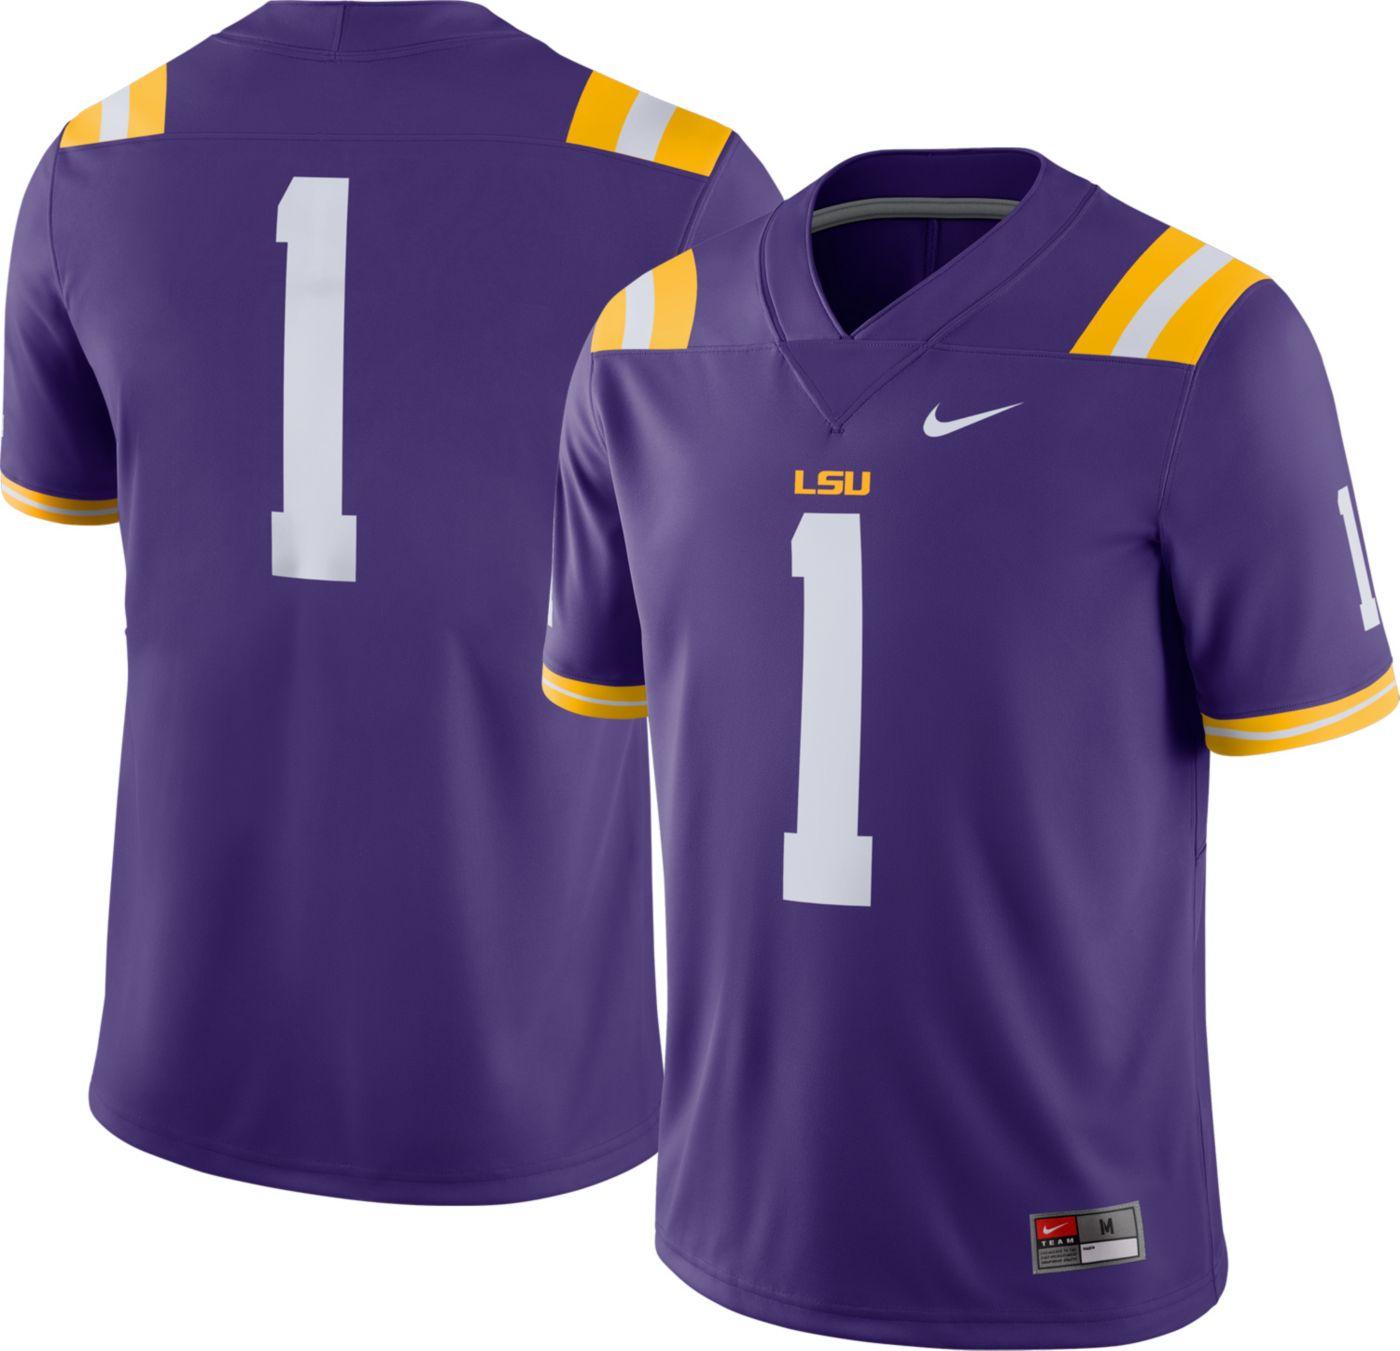 Nike Men's LSU Tigers #1 Purple Dri-FIT Game Football Jersey